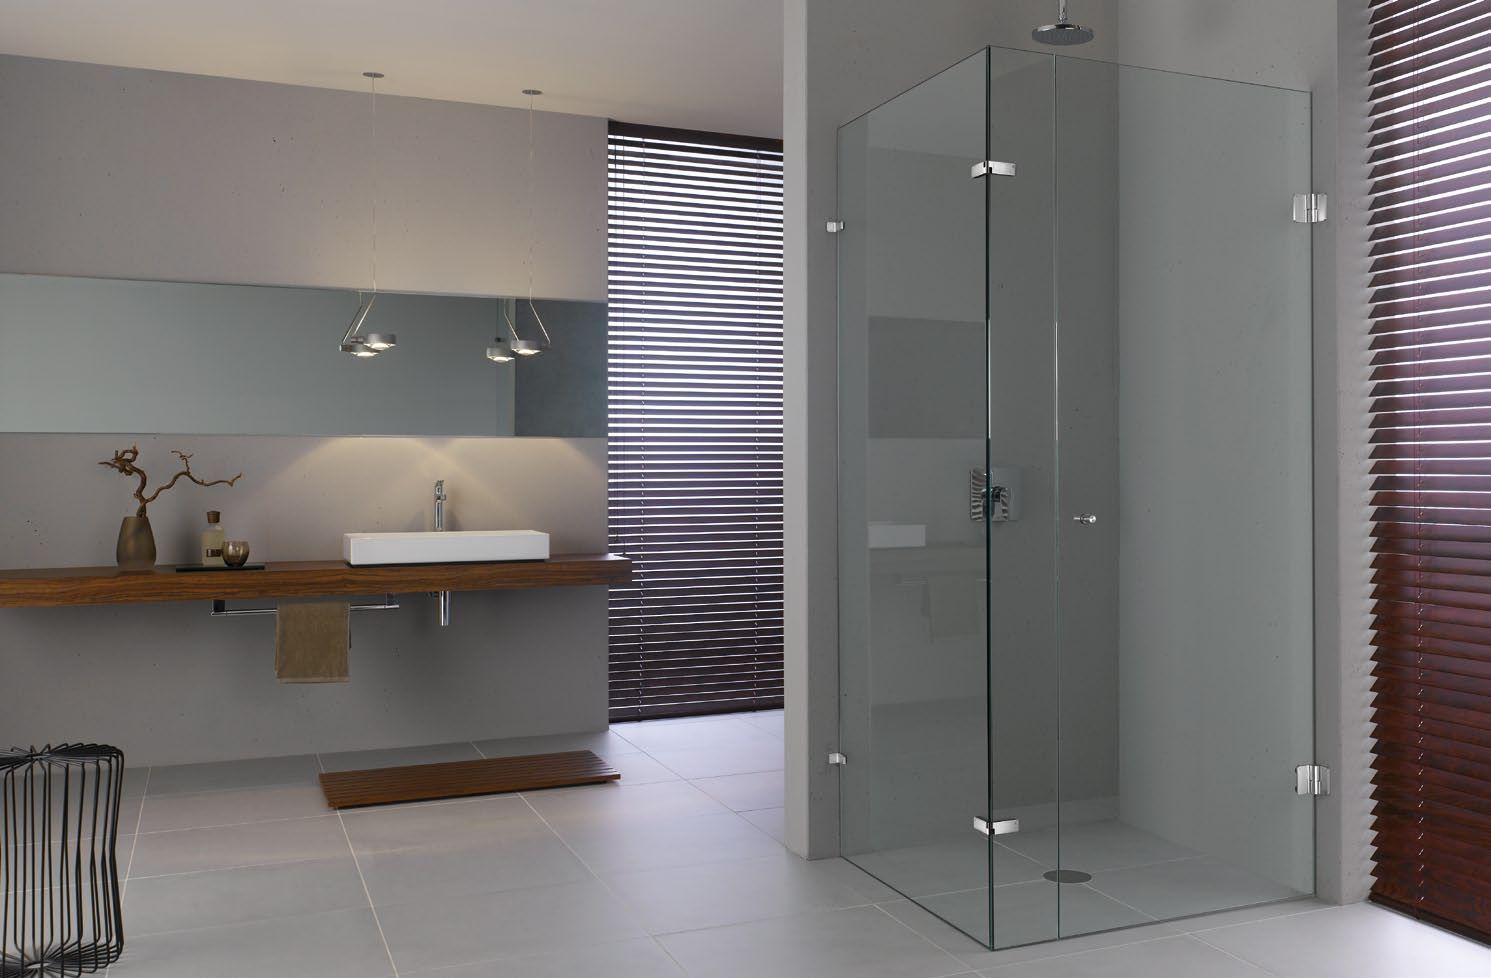 shower enclosures - Google Search | BATHROOMS | Pinterest | Shower ...